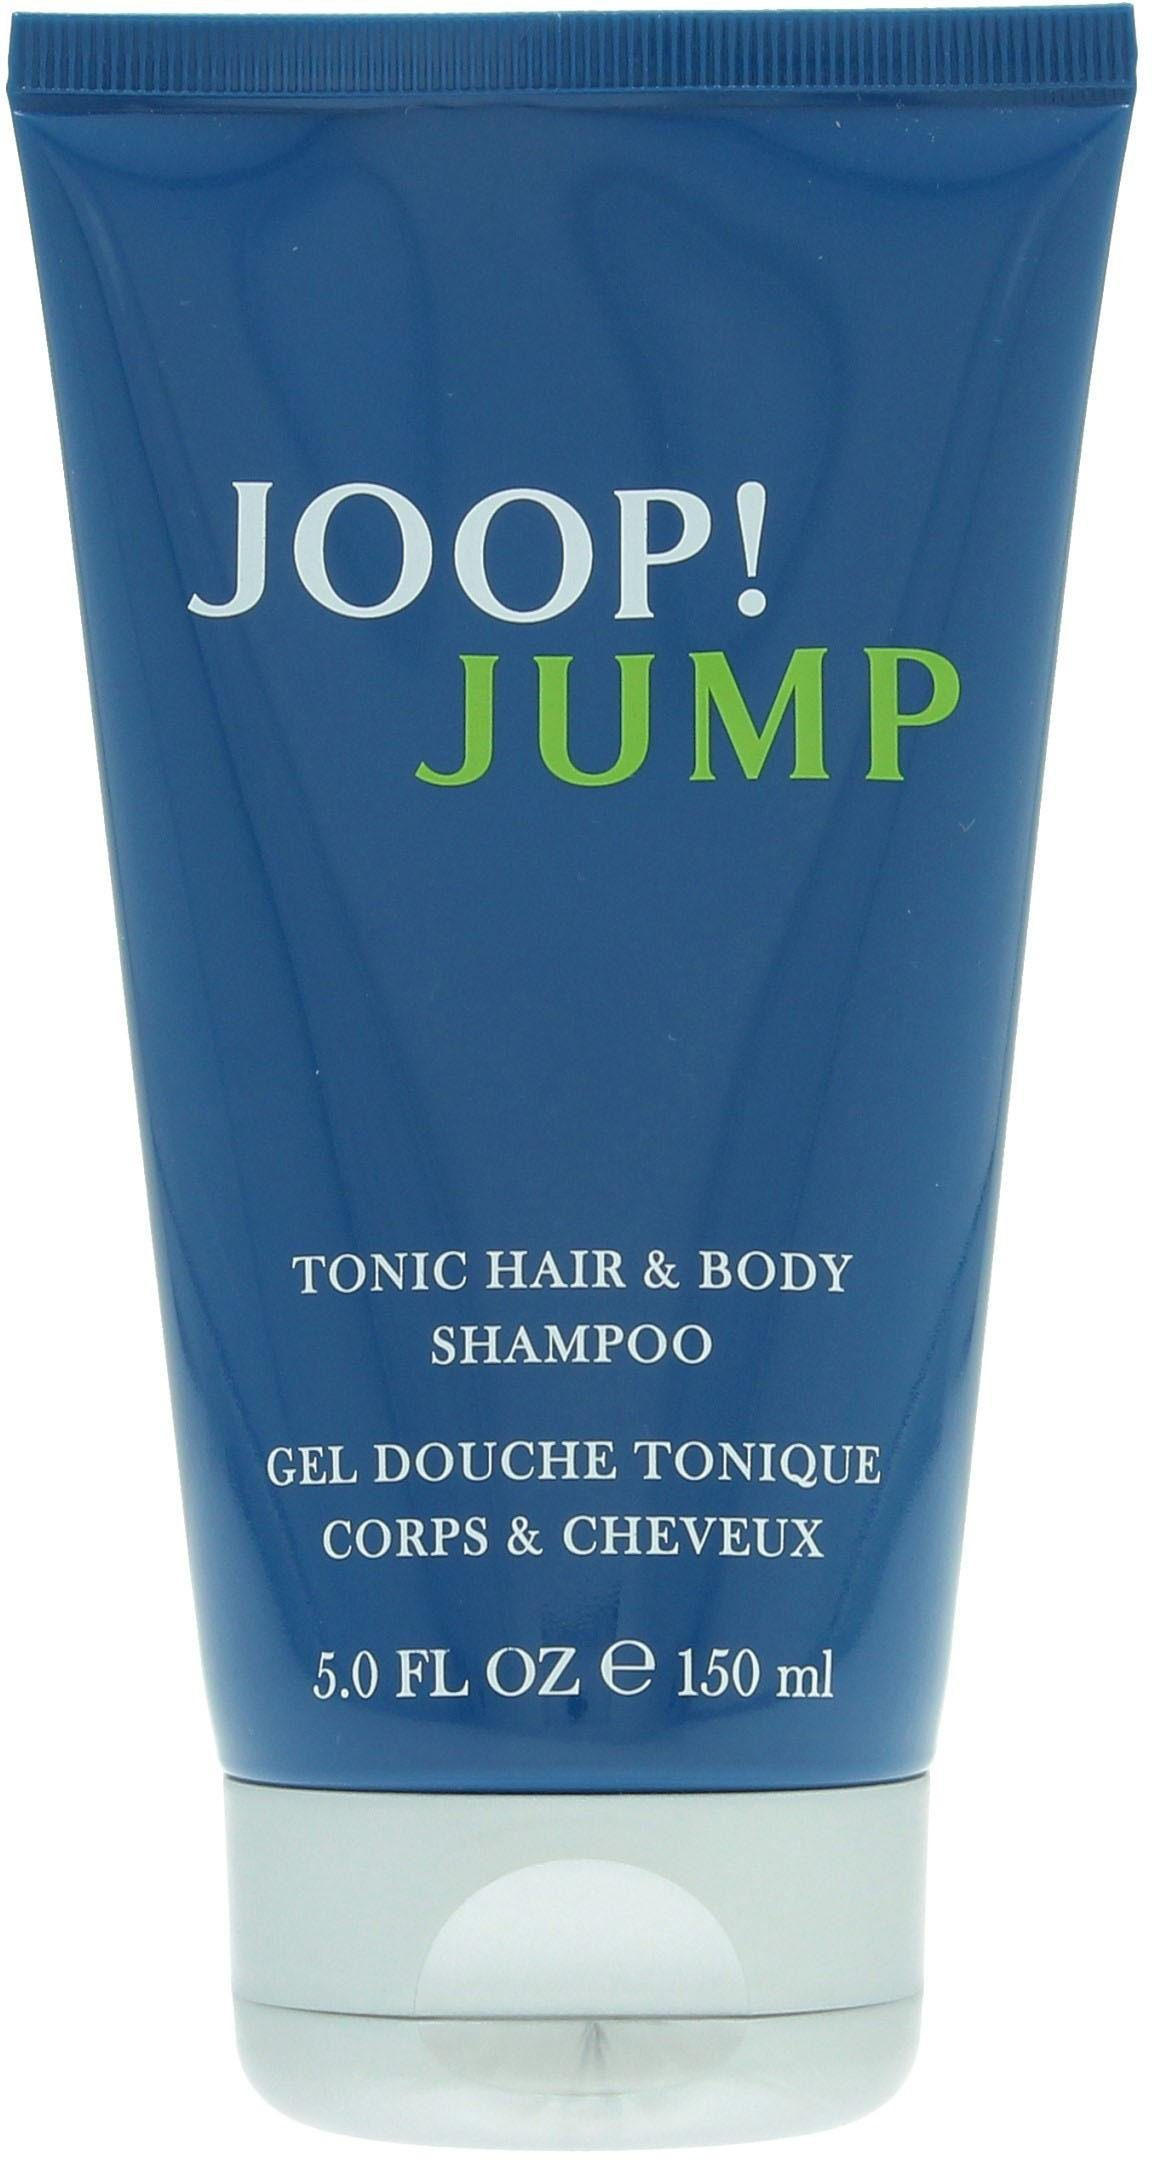 Joop!, »Jump«, Tonic Hair & Body Shampoo